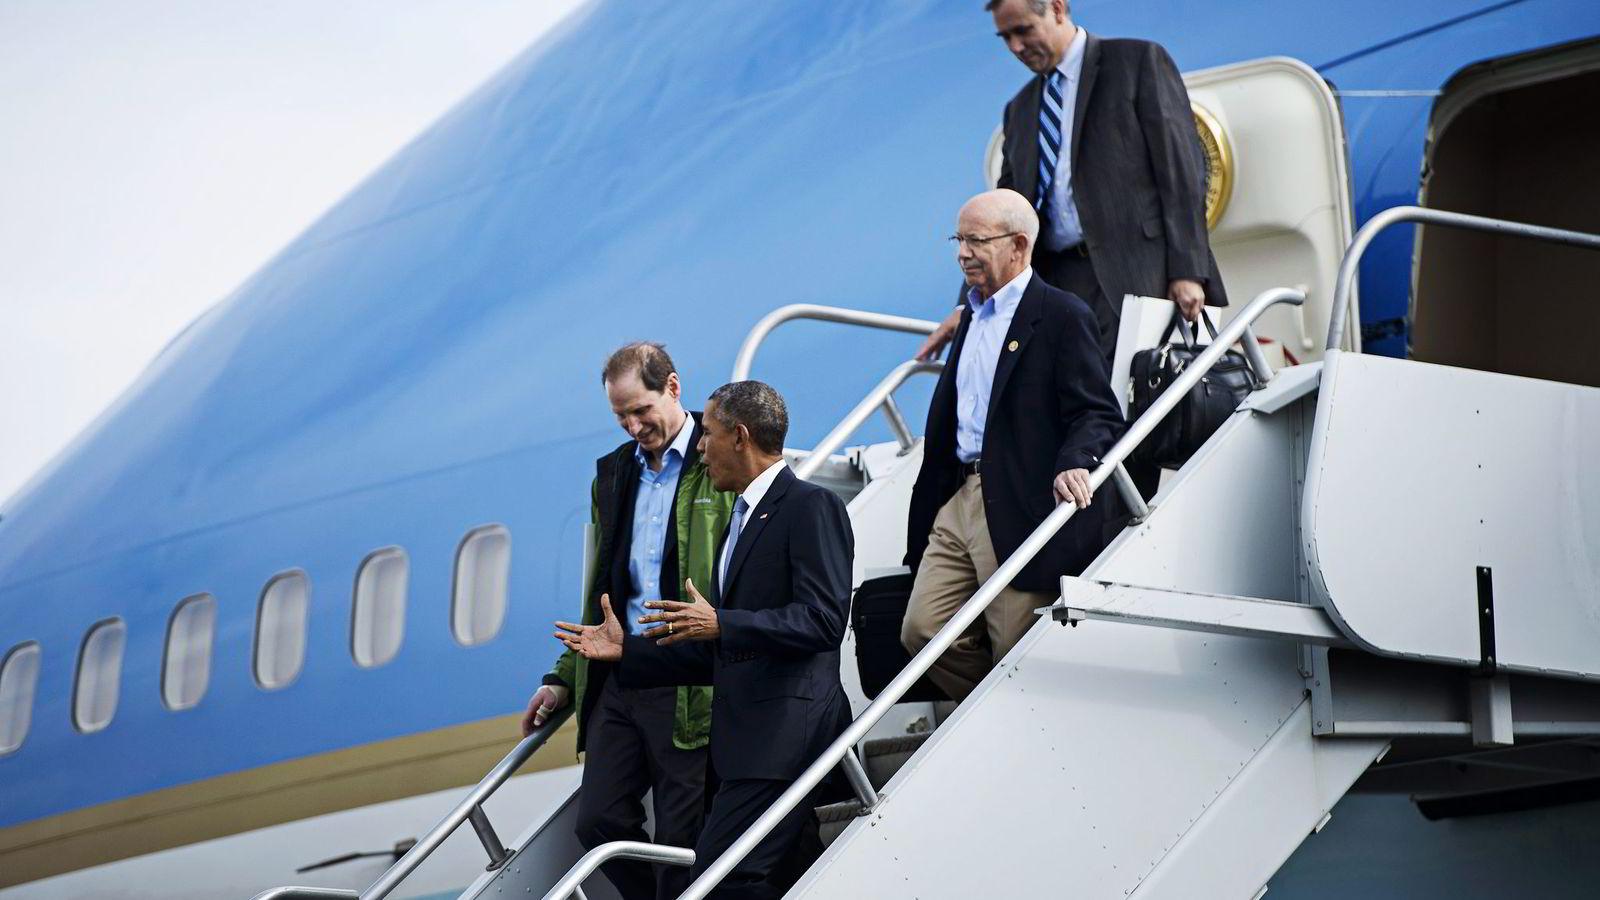 Peter DeFazio (med briller), en sentral politiker i Demokratene, går hardt ut mot Norwegian, som han mener bryter med arbeidslivsregler i USA og EU. Foto: Brendan Smialowski/AFP/NTB Scanpix